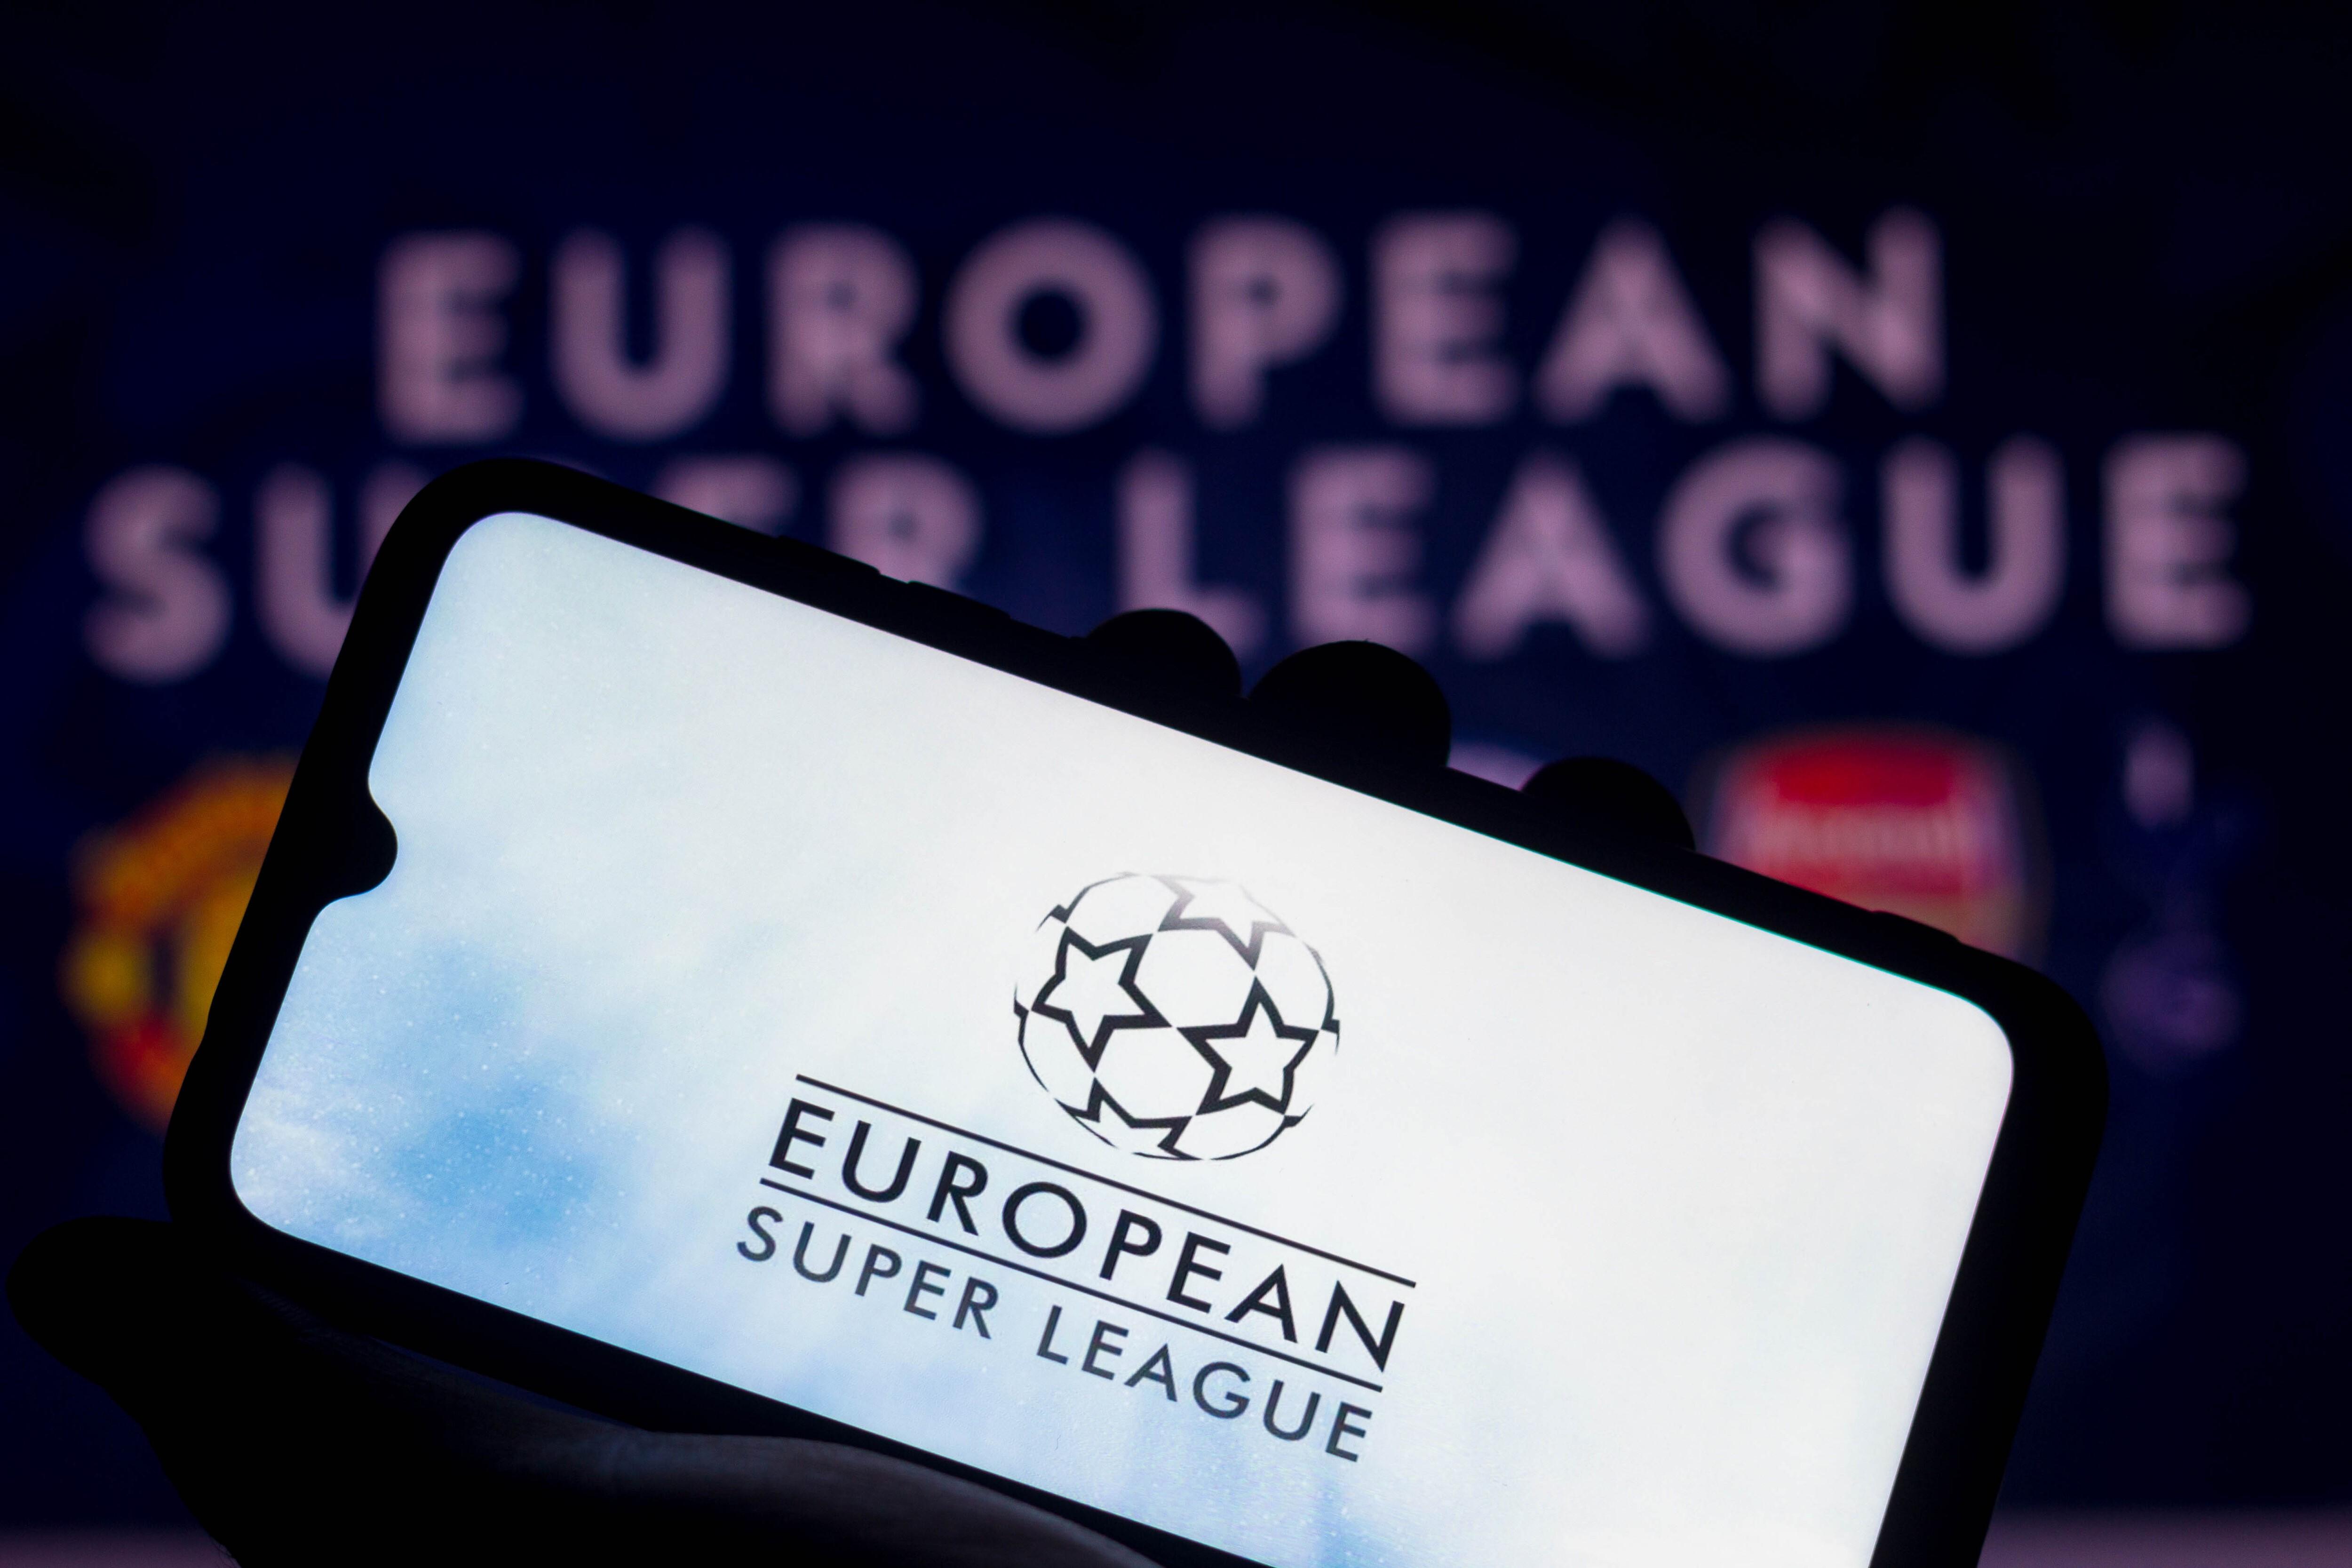 https://i.eurosport.com/2021/04/21/3118385.jpg